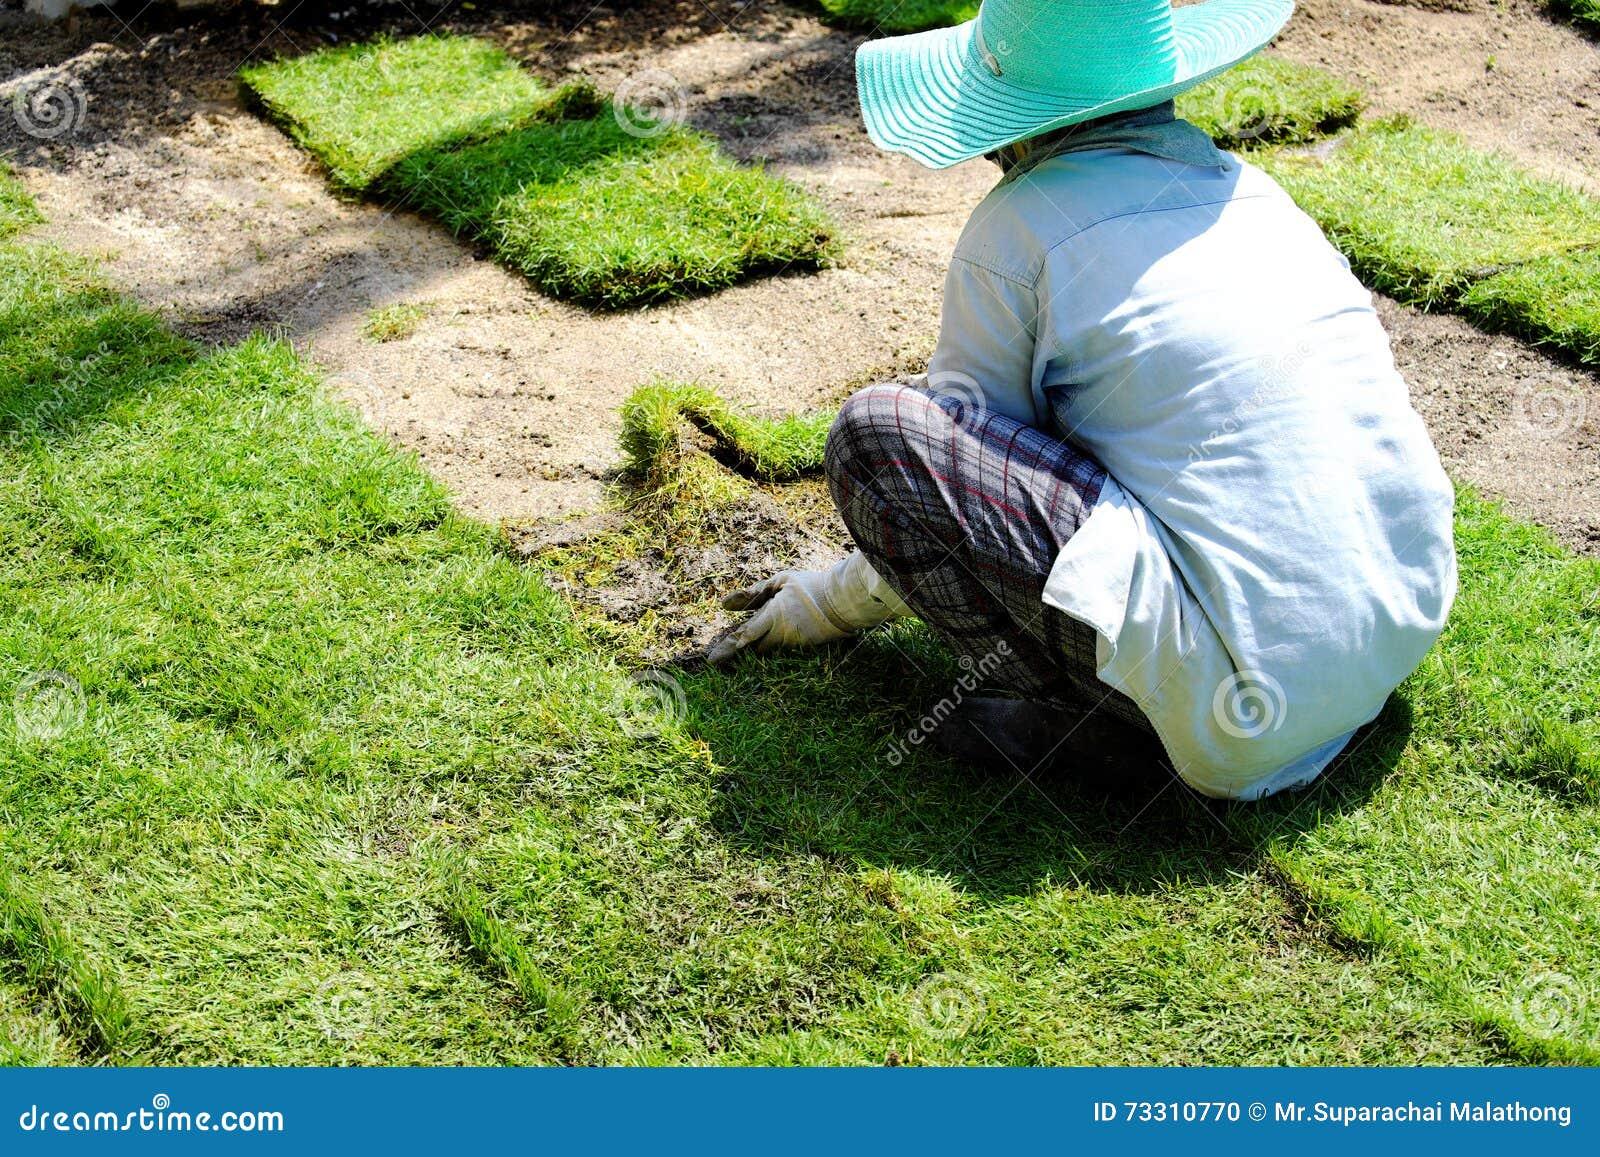 Gardeners are planting grass